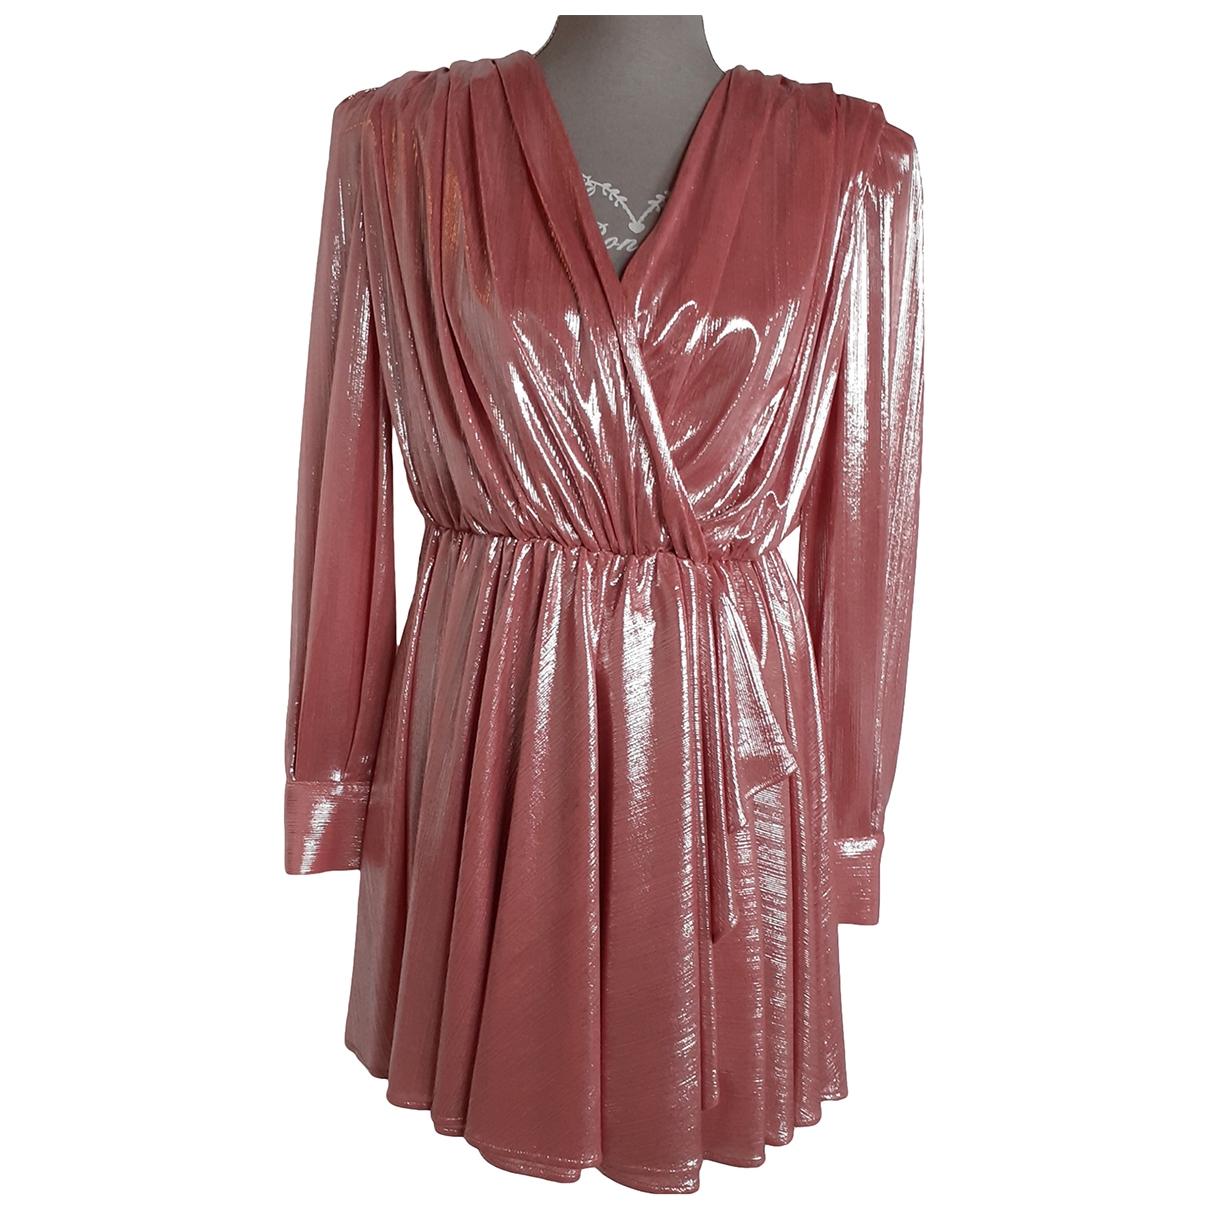 Msgm \N Pink dress for Women 40 IT